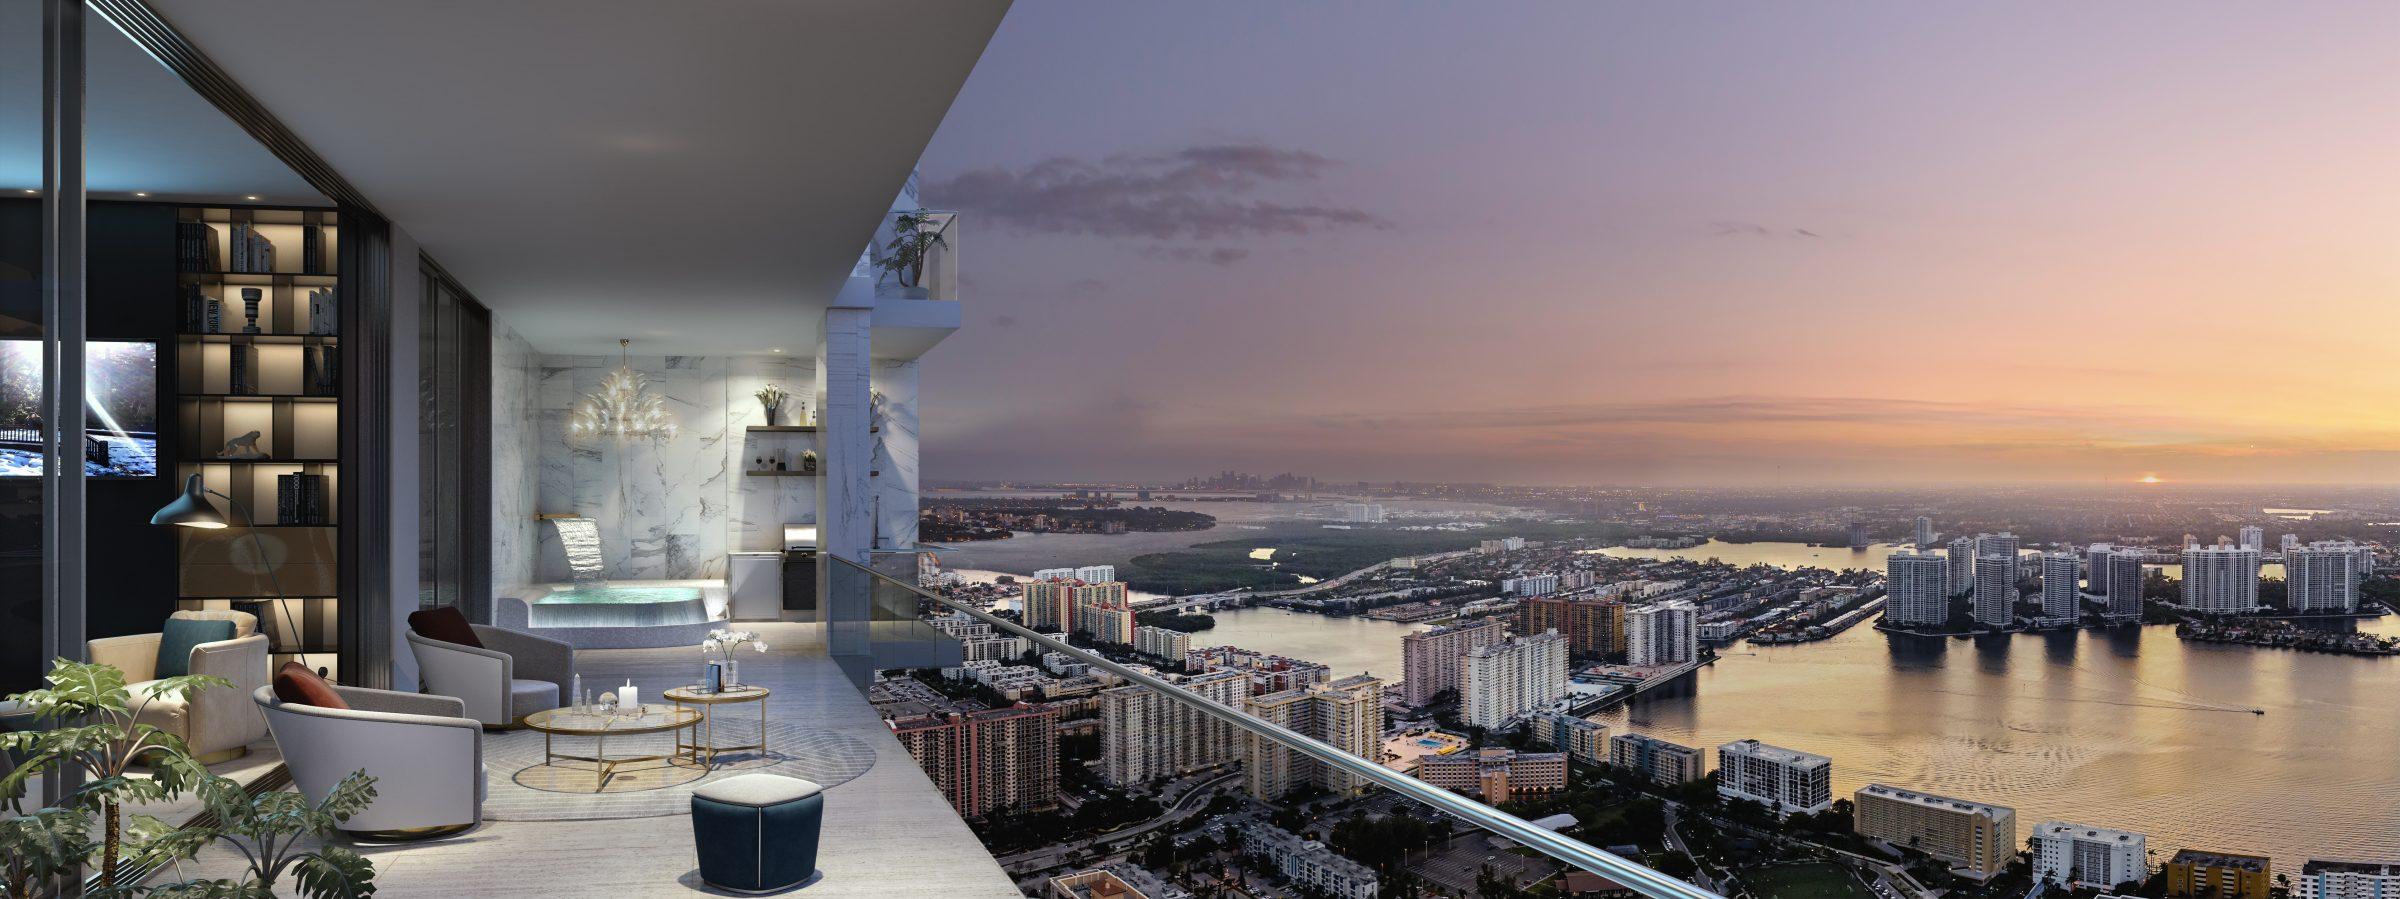 Night-Balcony-1-2400x899.jpg